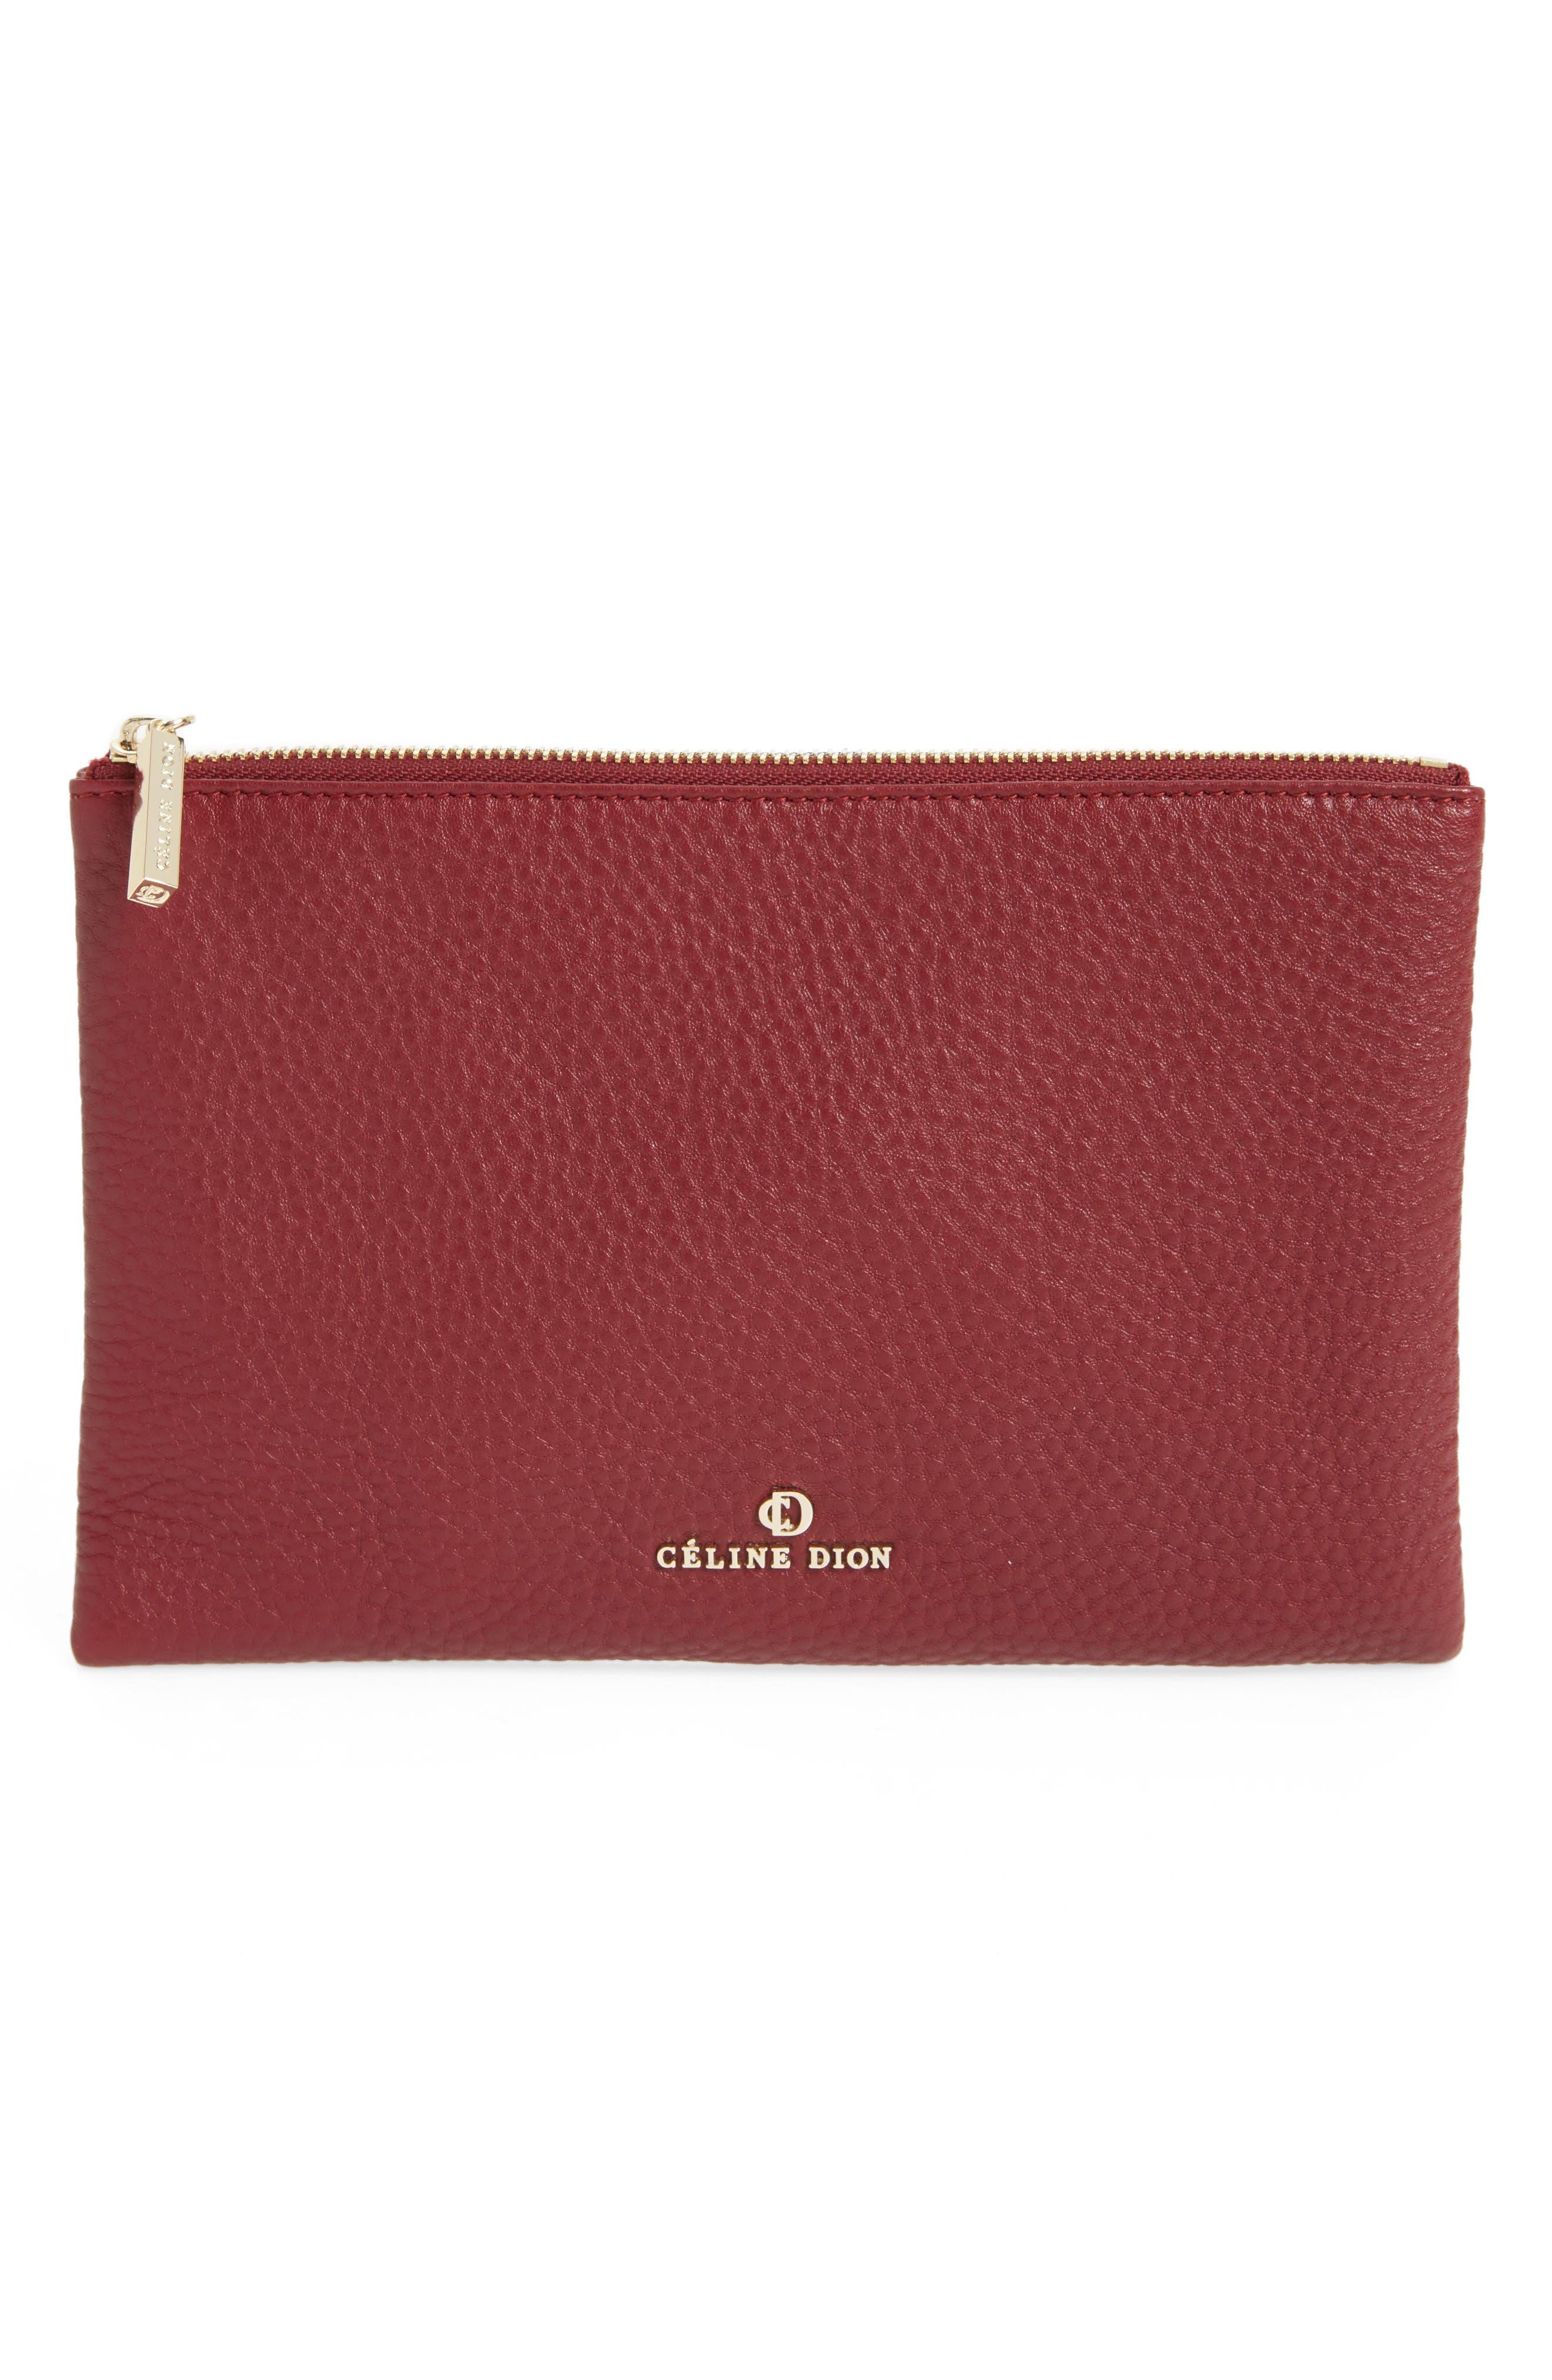 Main Image - Céline Dion Adagio Leather Zip Pouch